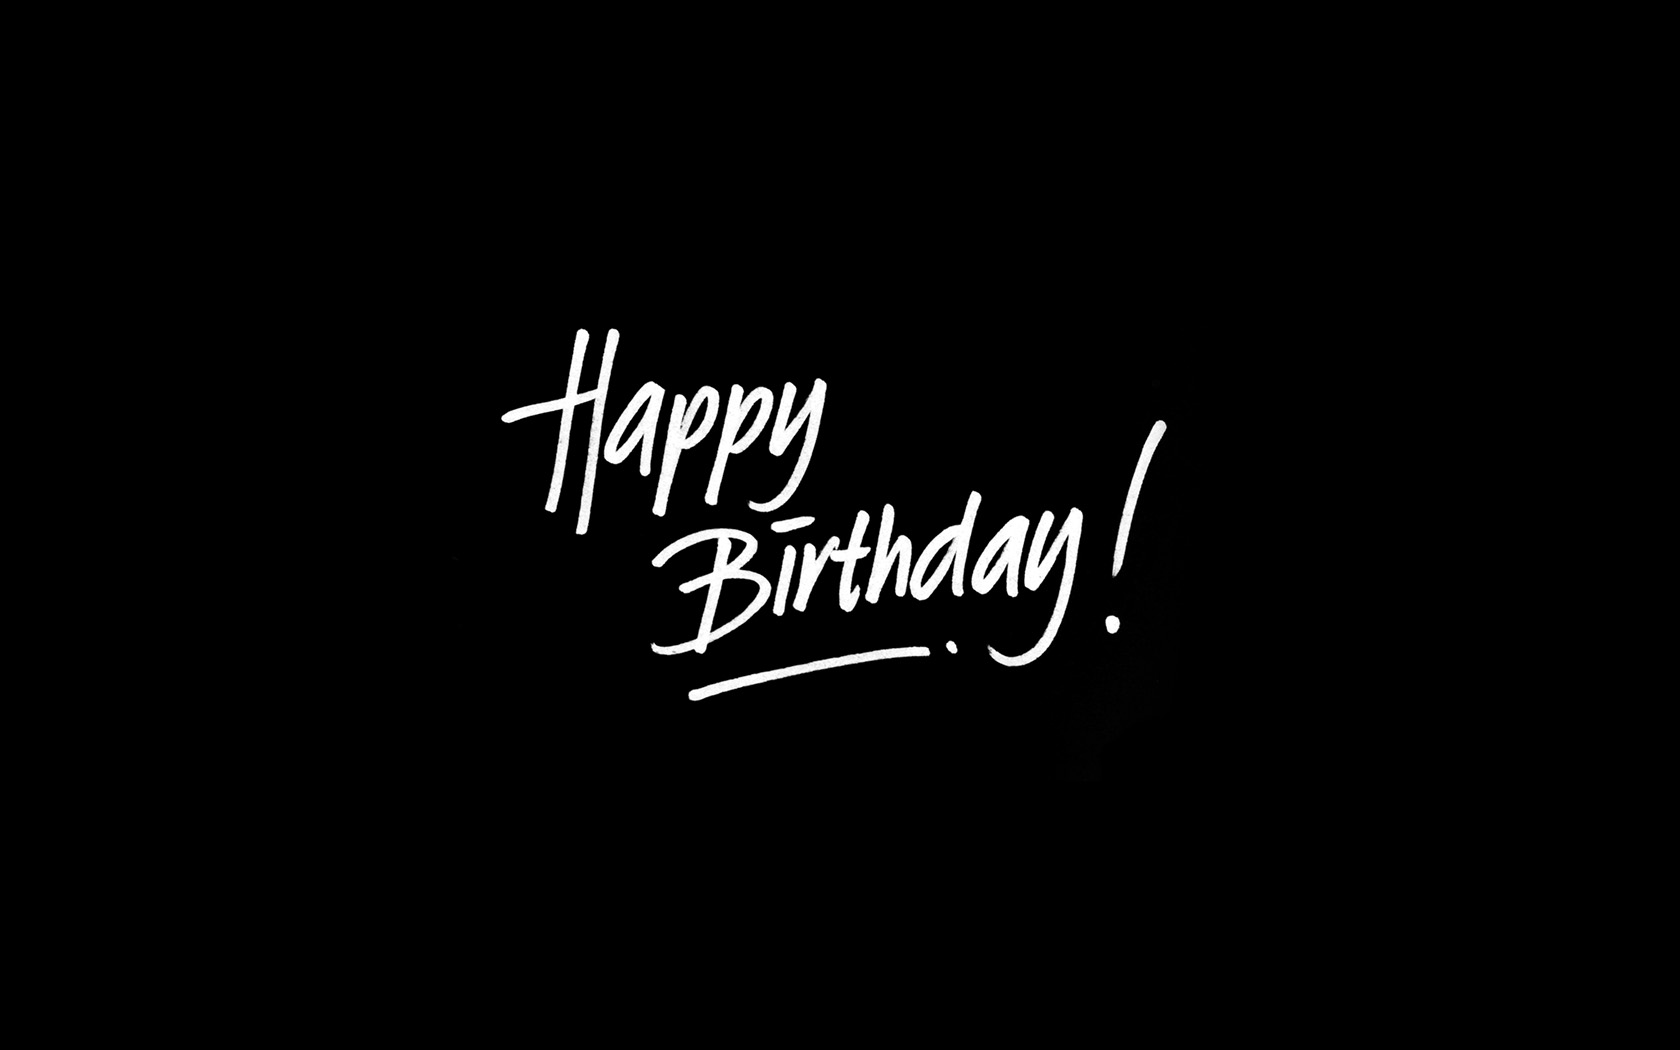 Ap54 happy birthday dark event writing wallpaper - Zedge happy birthday wallpapers ...